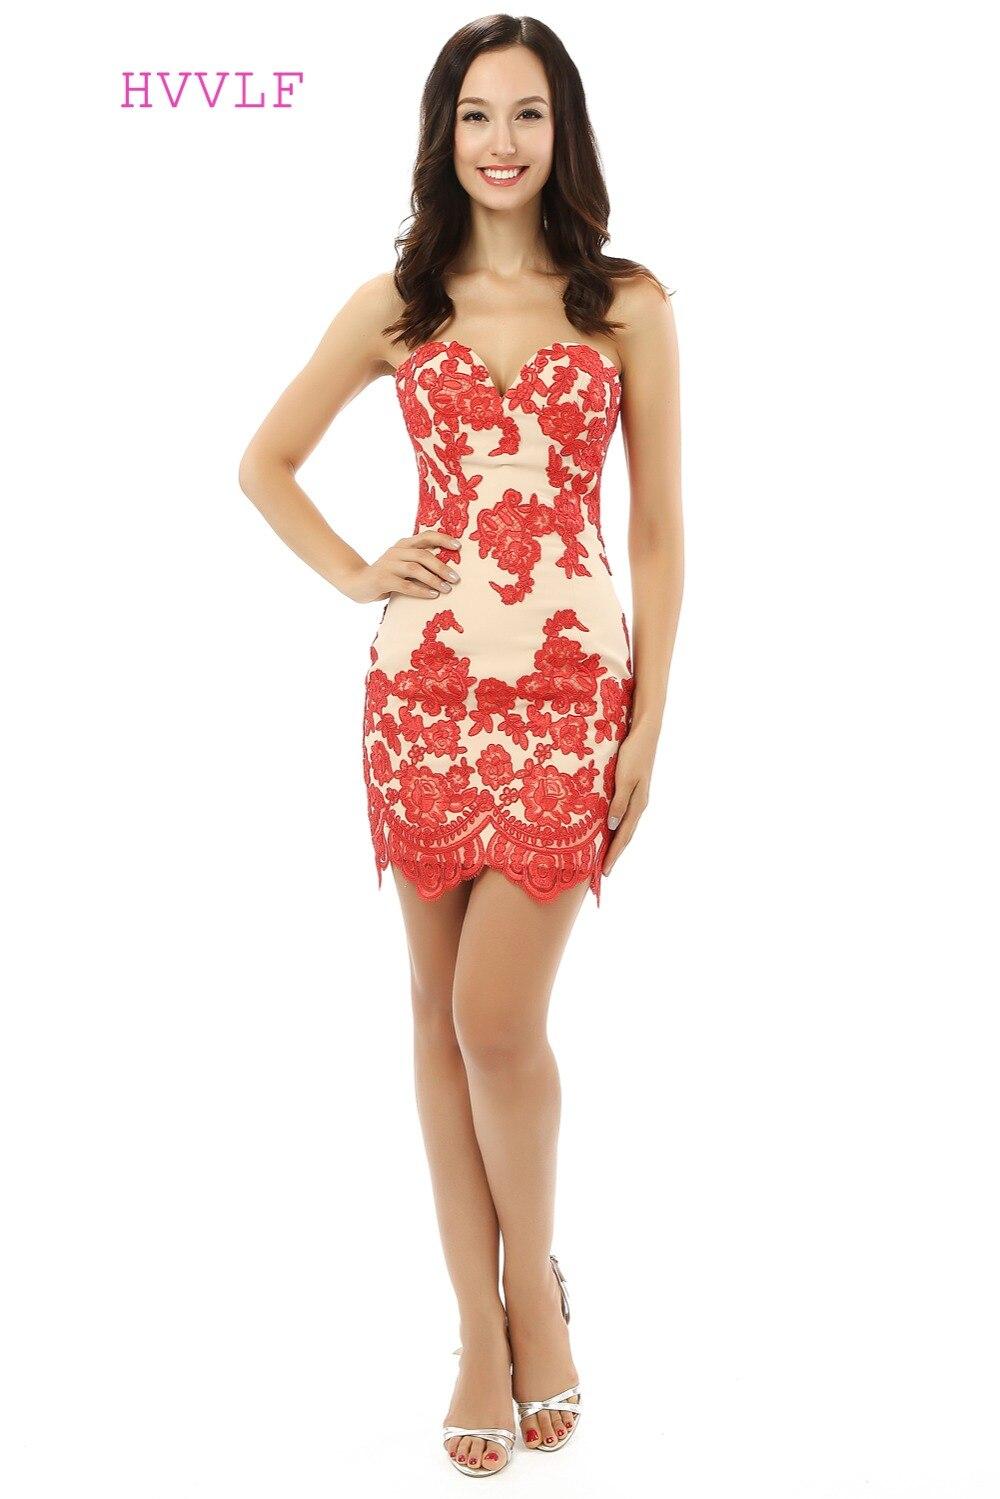 Red Elegant Cocktail Dresses Sheath Sweetheart Satin Appliques Lace Short Mini Homecoming Dresses 2019